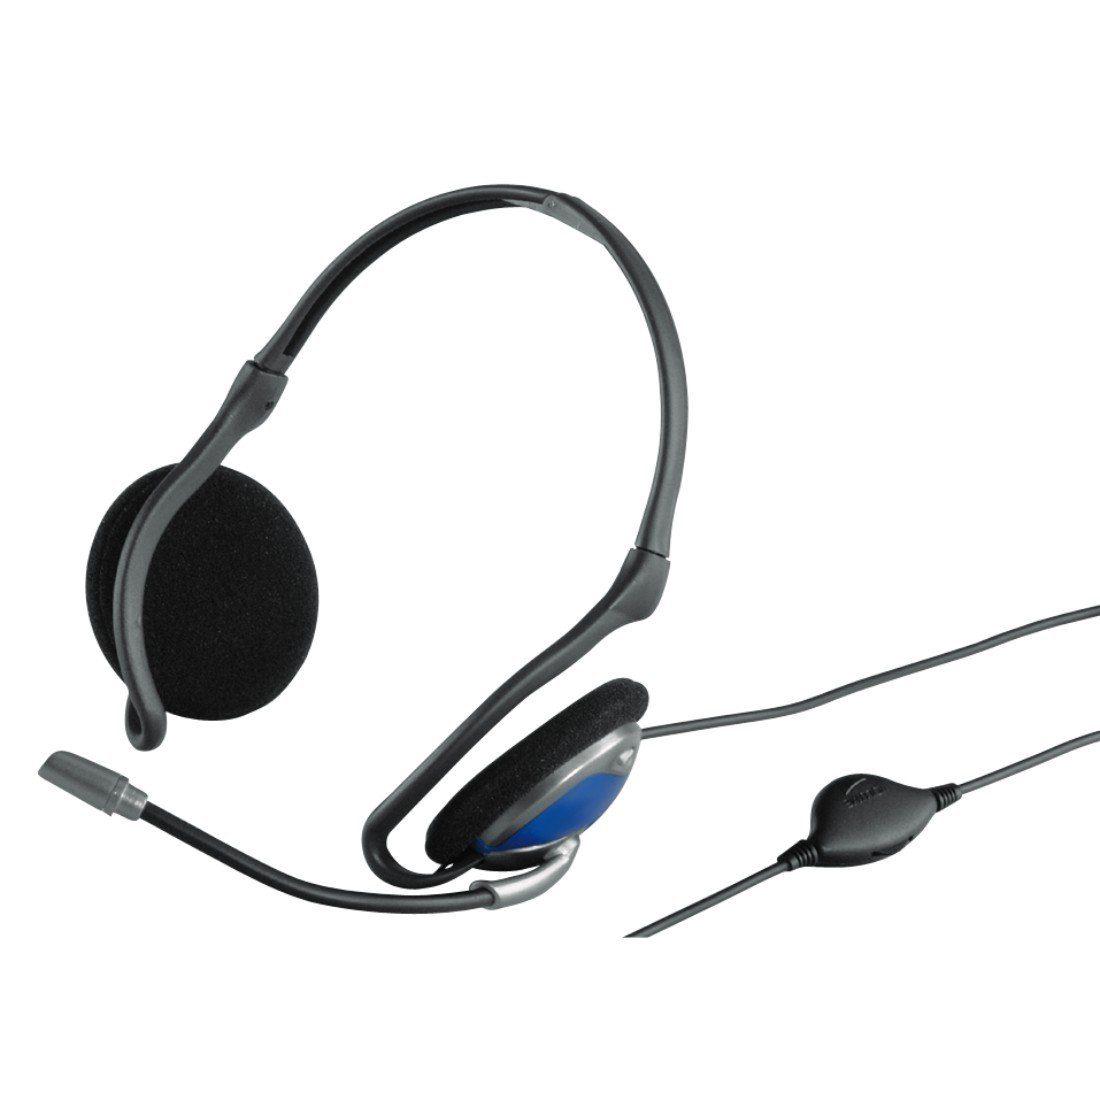 Exxter PC-Nacken-Headset HE-200